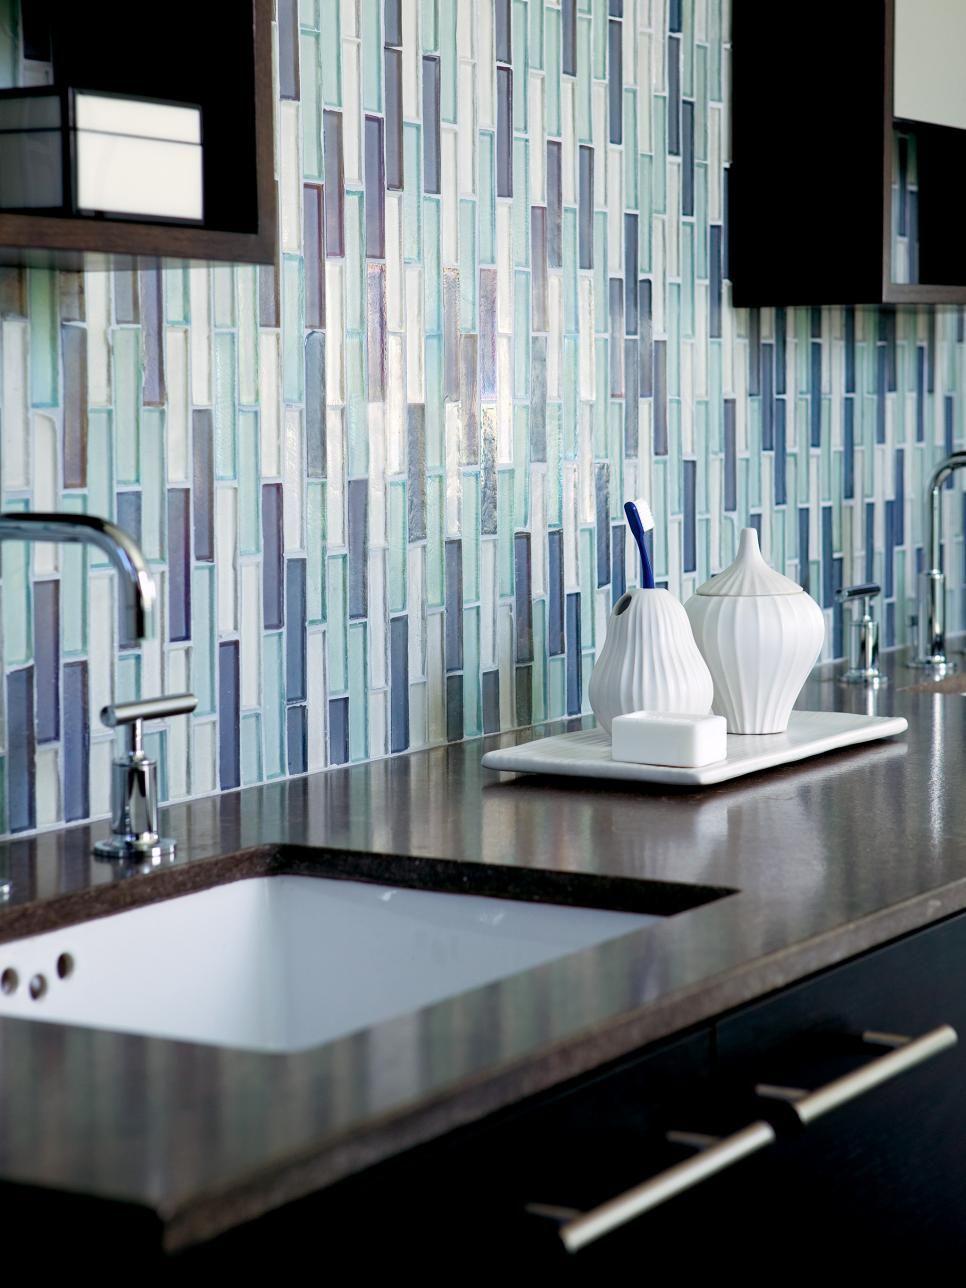 Bathroom Tiles for Every Budget and Design Style | Bath ideas ...